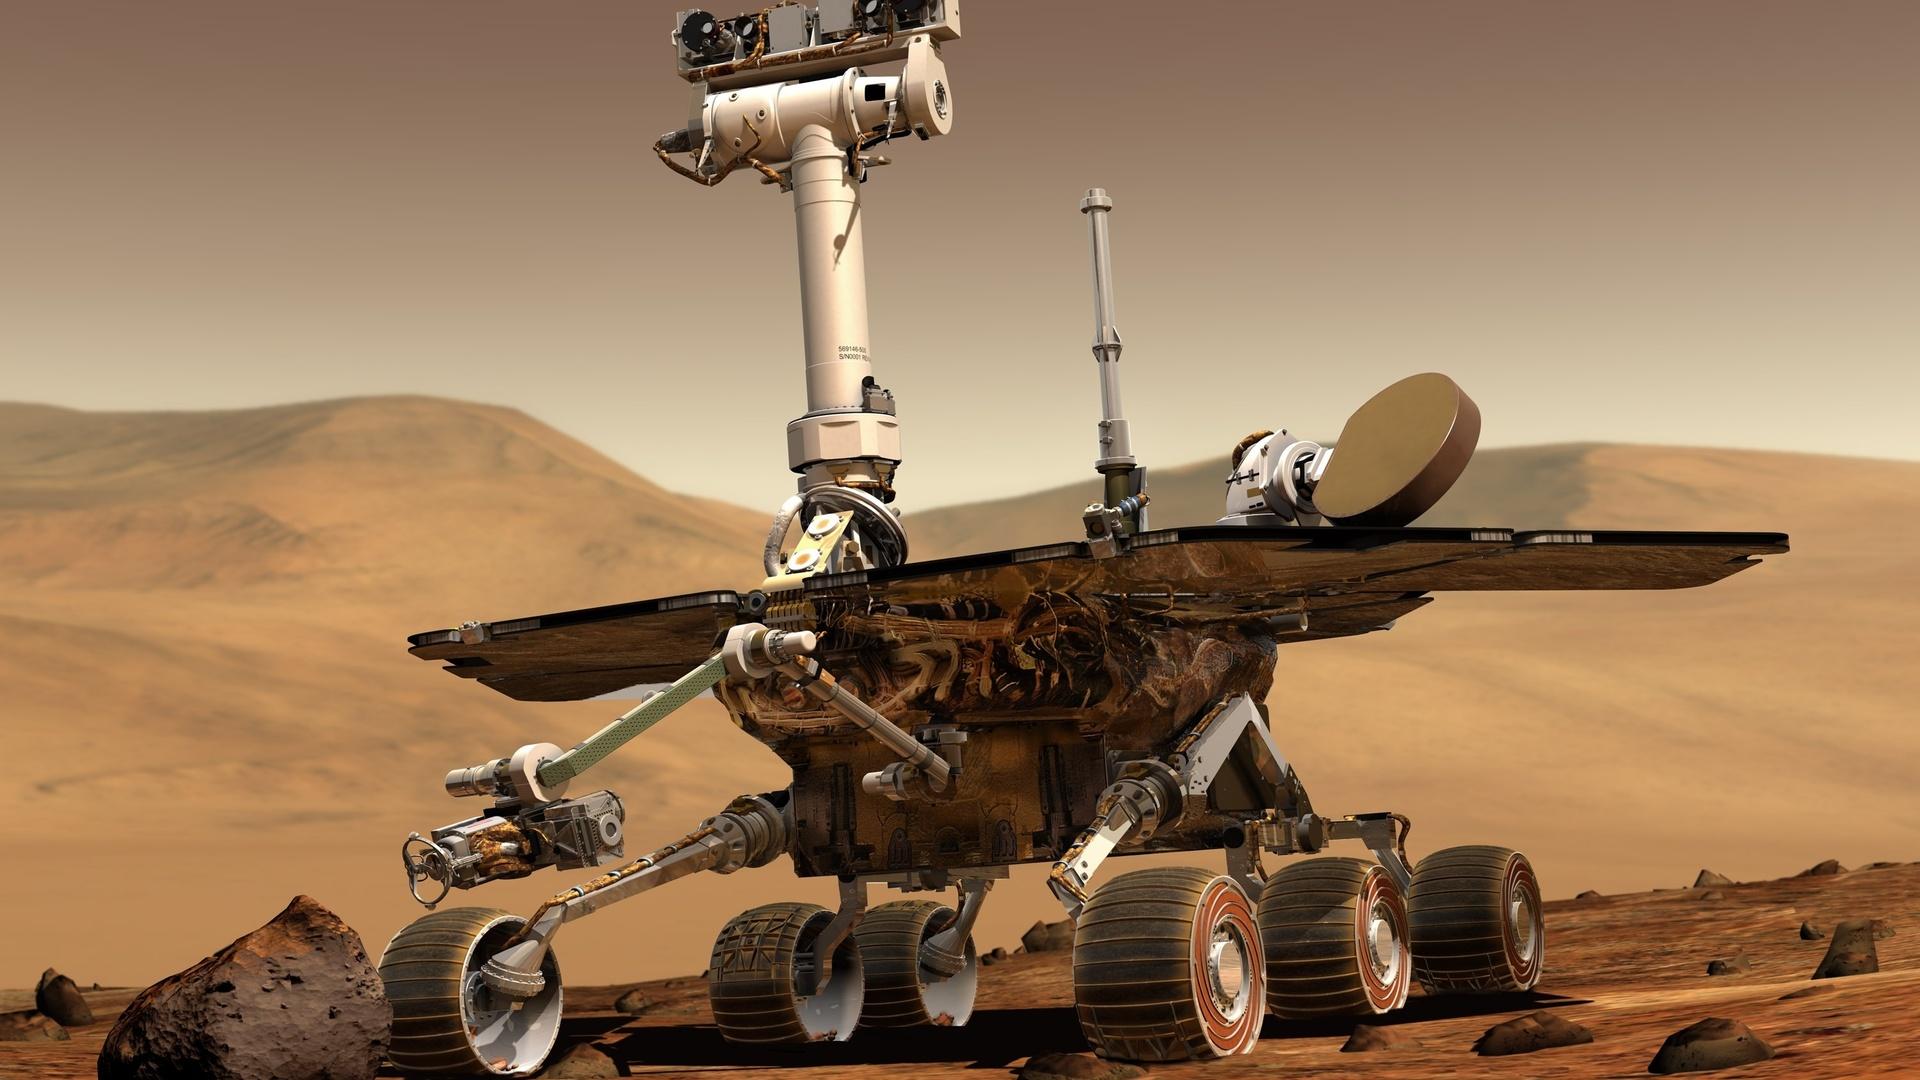 космос, цифровые, марс, марсоход, исследования, наука